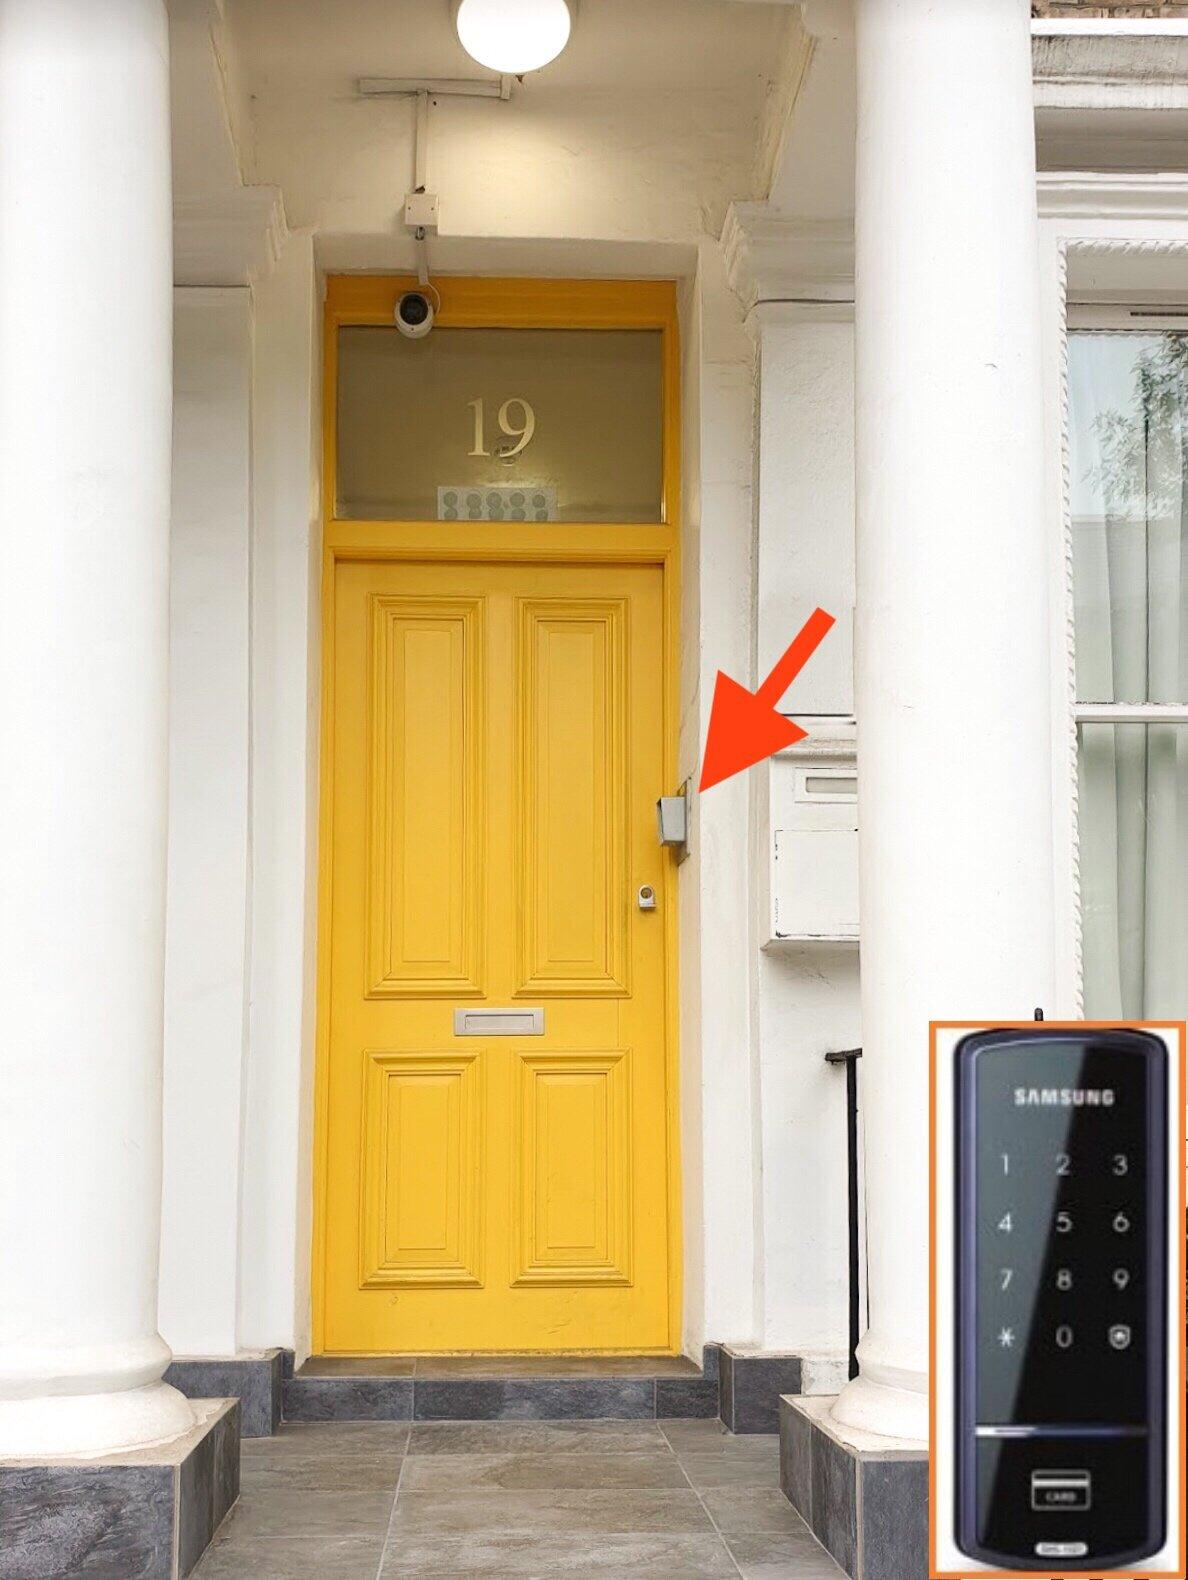 yellowfrontdoor.JPG